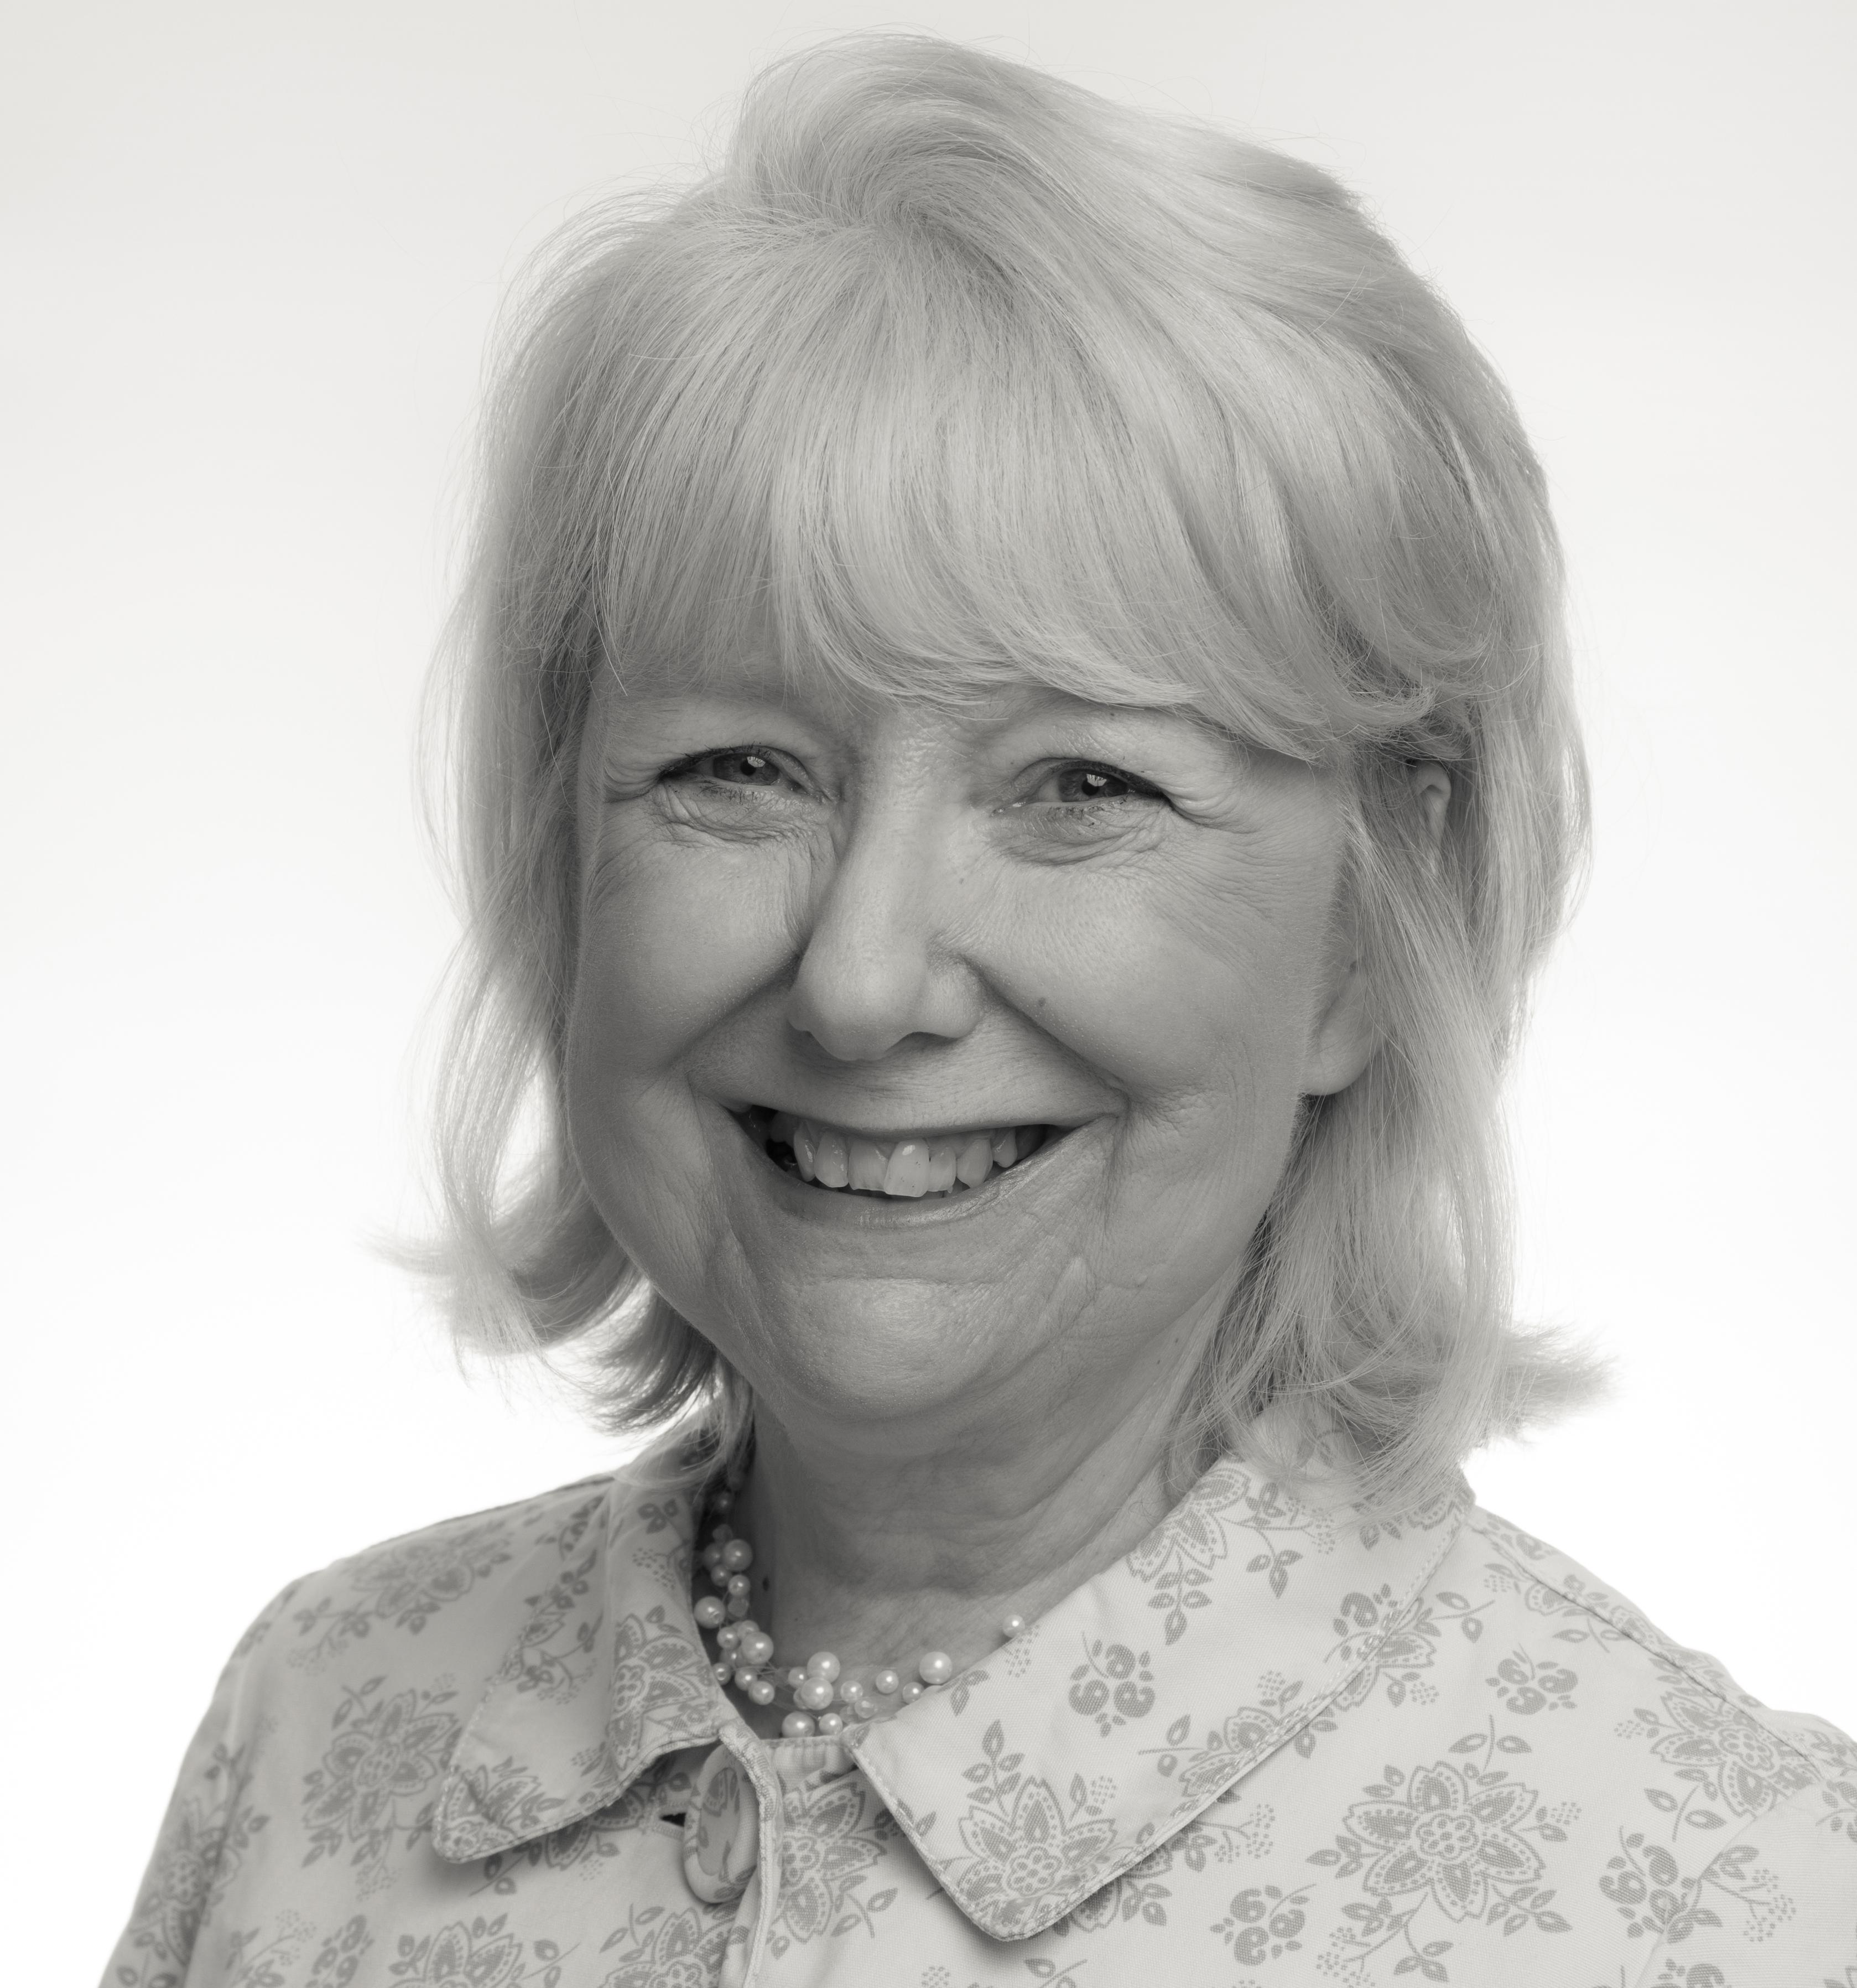 Janice Allard